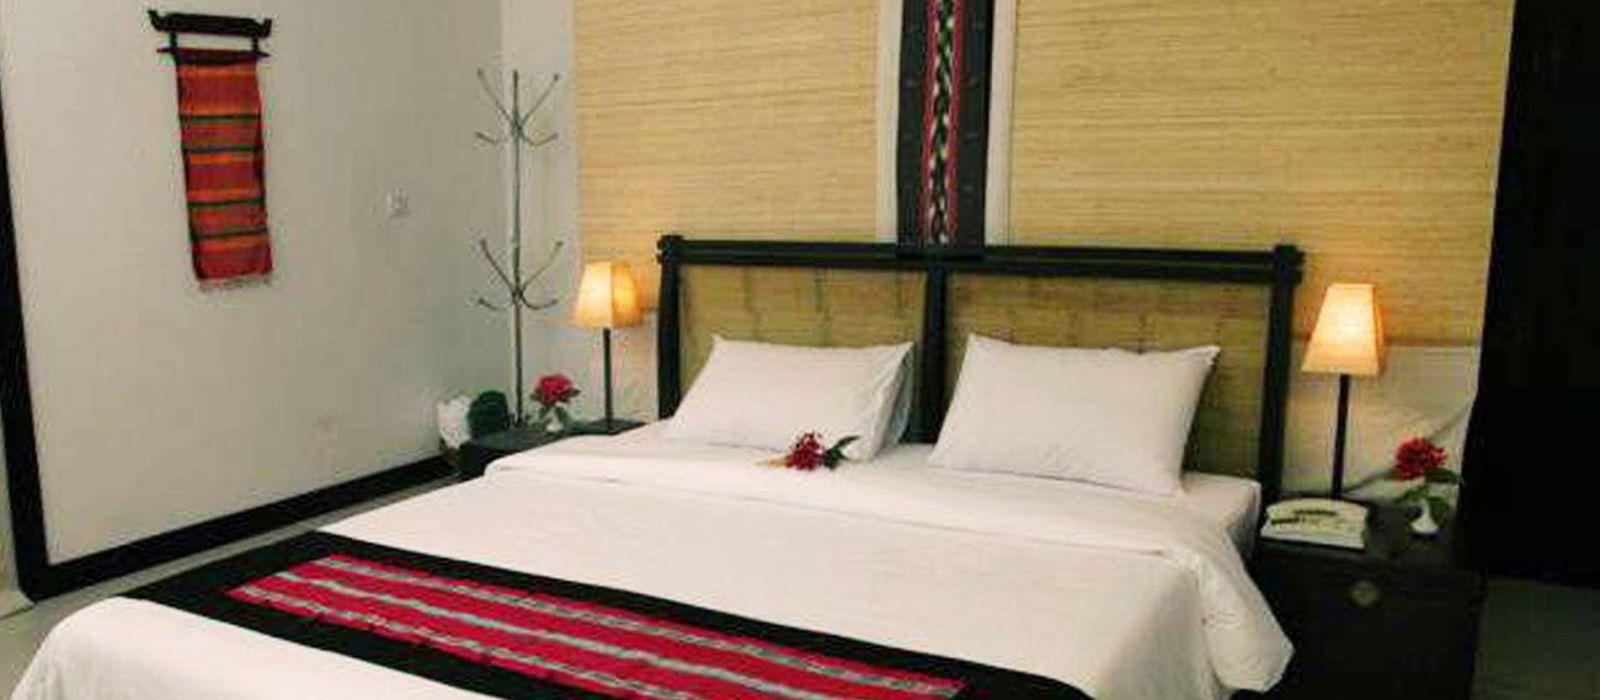 Hotel La Maison dAngkor Kambodscha